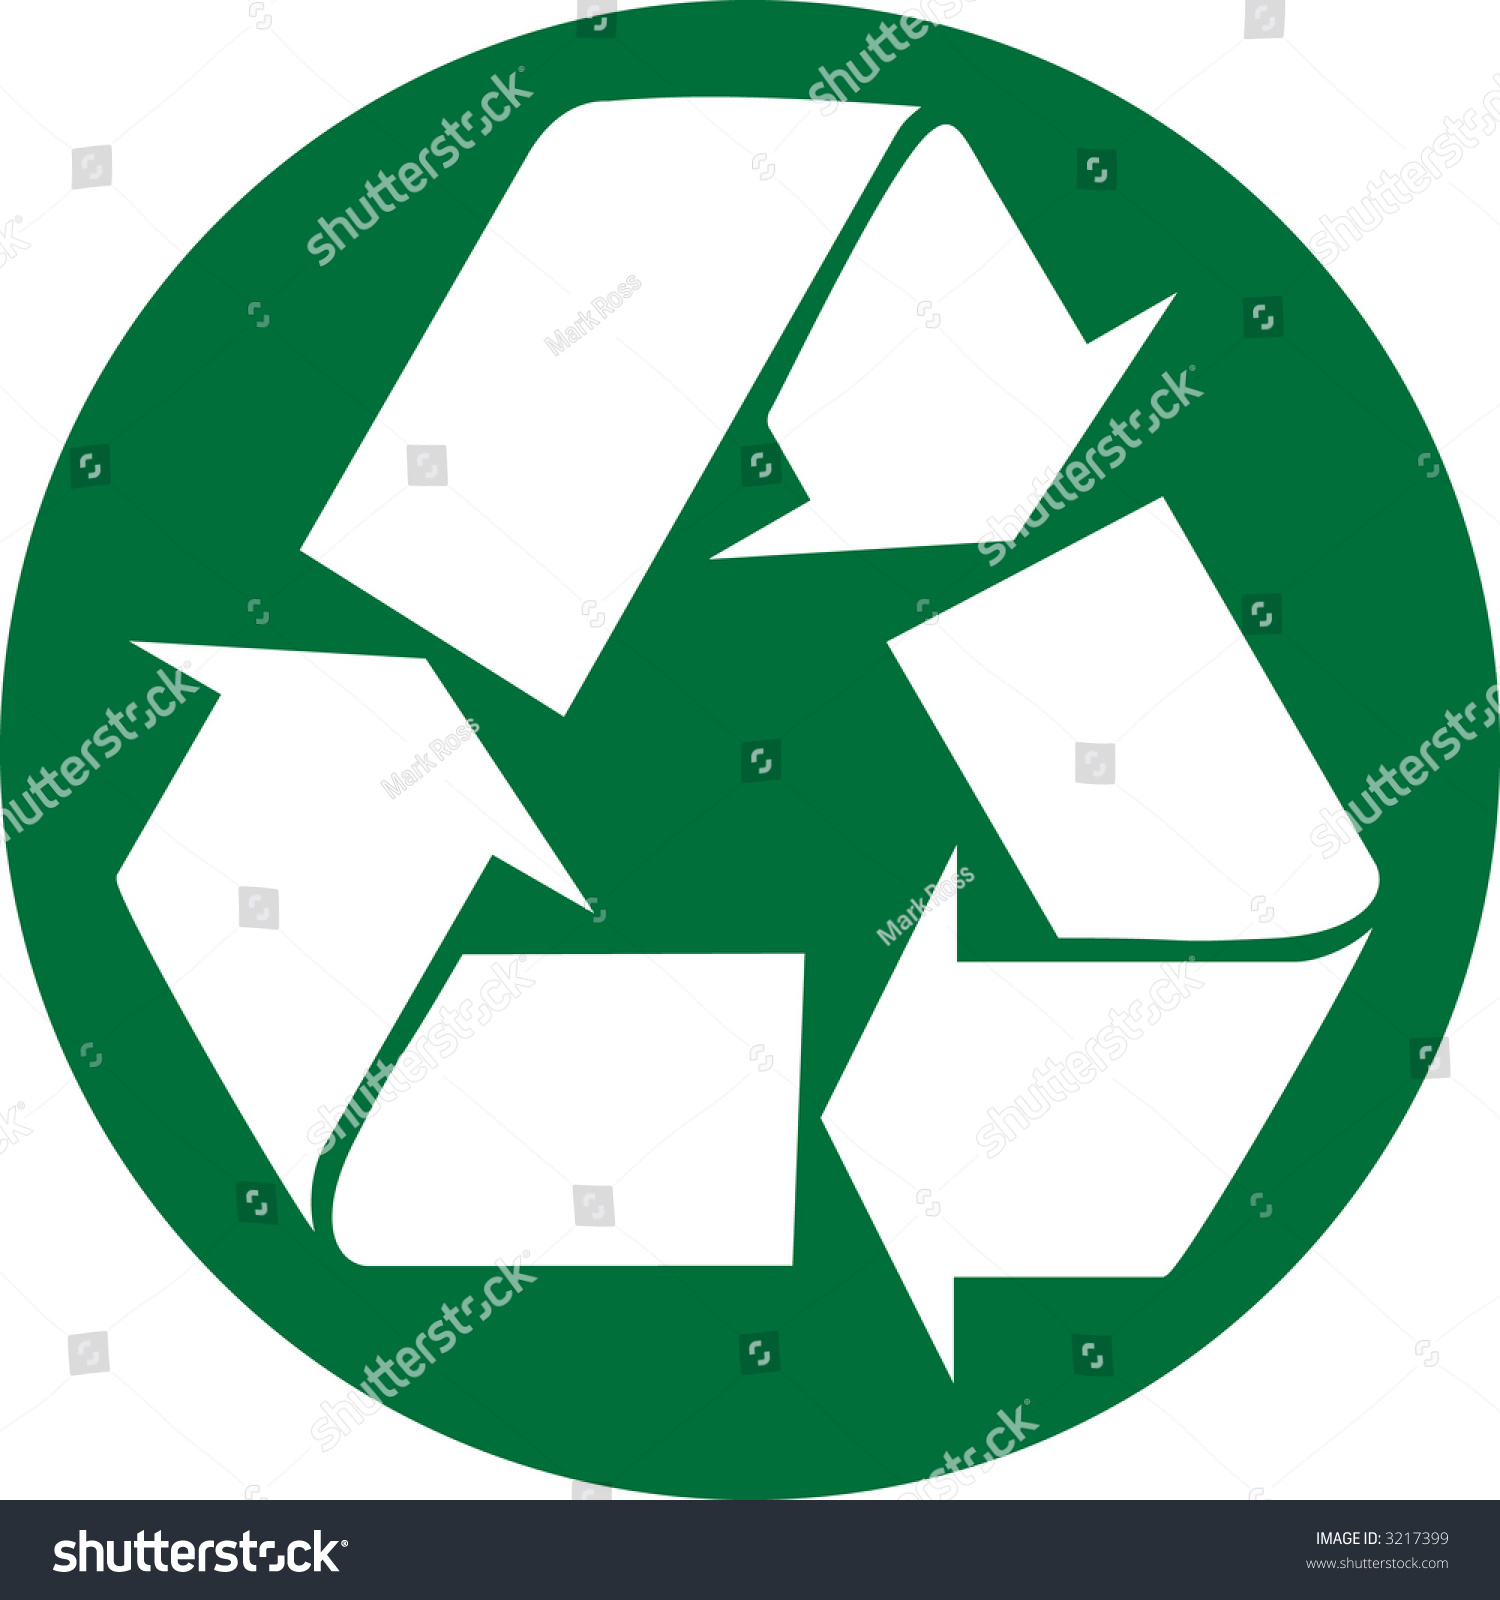 White recycle symbol green circle stock illustration 3217399 white recycle symbol in green circle buycottarizona Choice Image